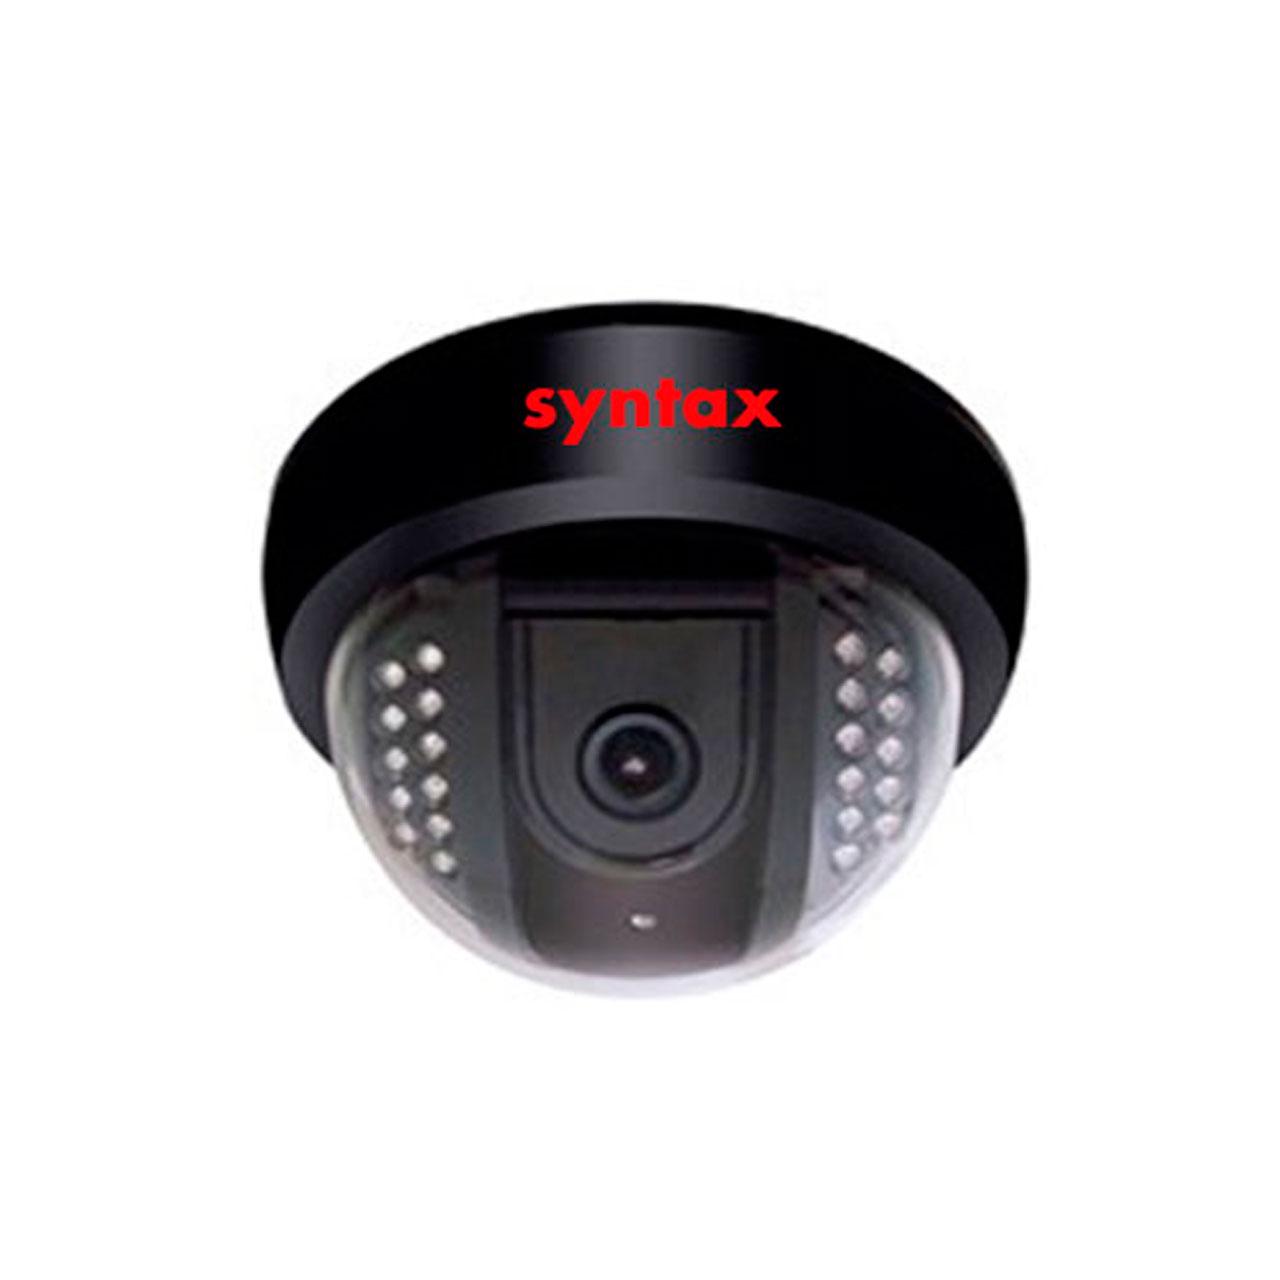 دوربین مداربسته دام مدار بسته مادون قرمز سینتکس 4201   syntax 4201 ir dome camera